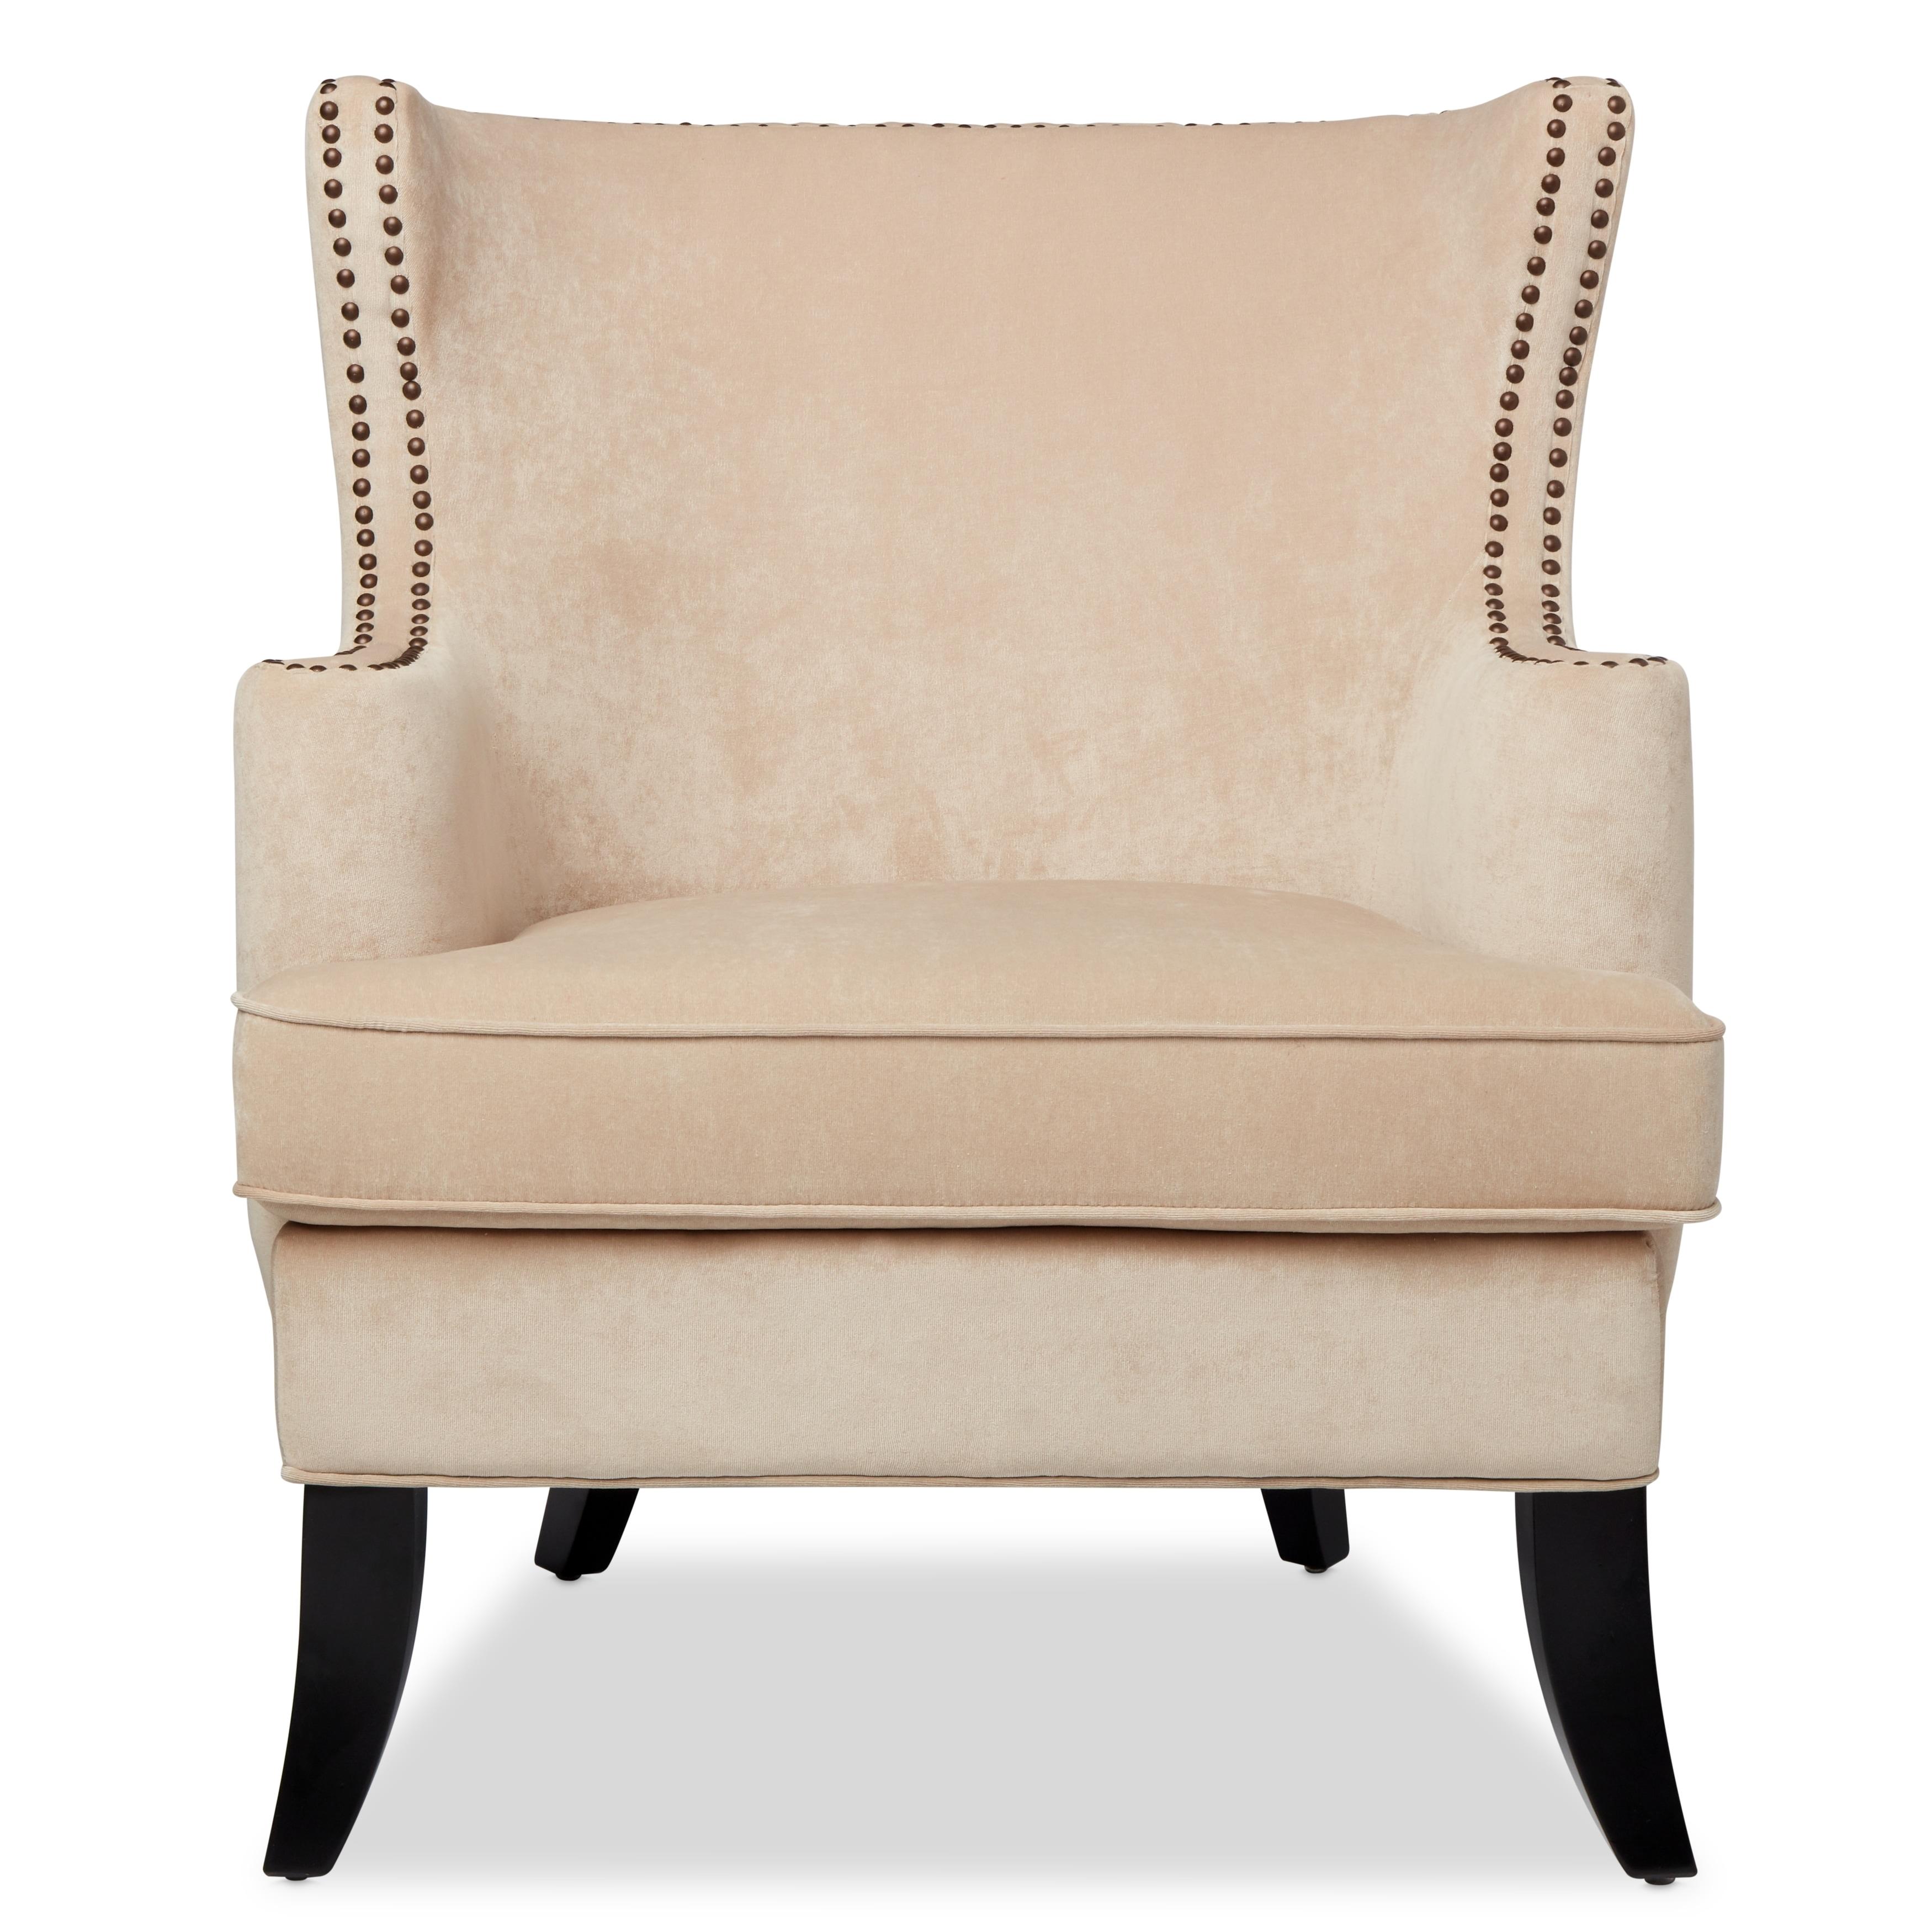 Beau Shop Abbyson Lauren Beige Velvet Nailhead Armchair   On Sale   Free  Shipping Today   Overstock.com   10518452